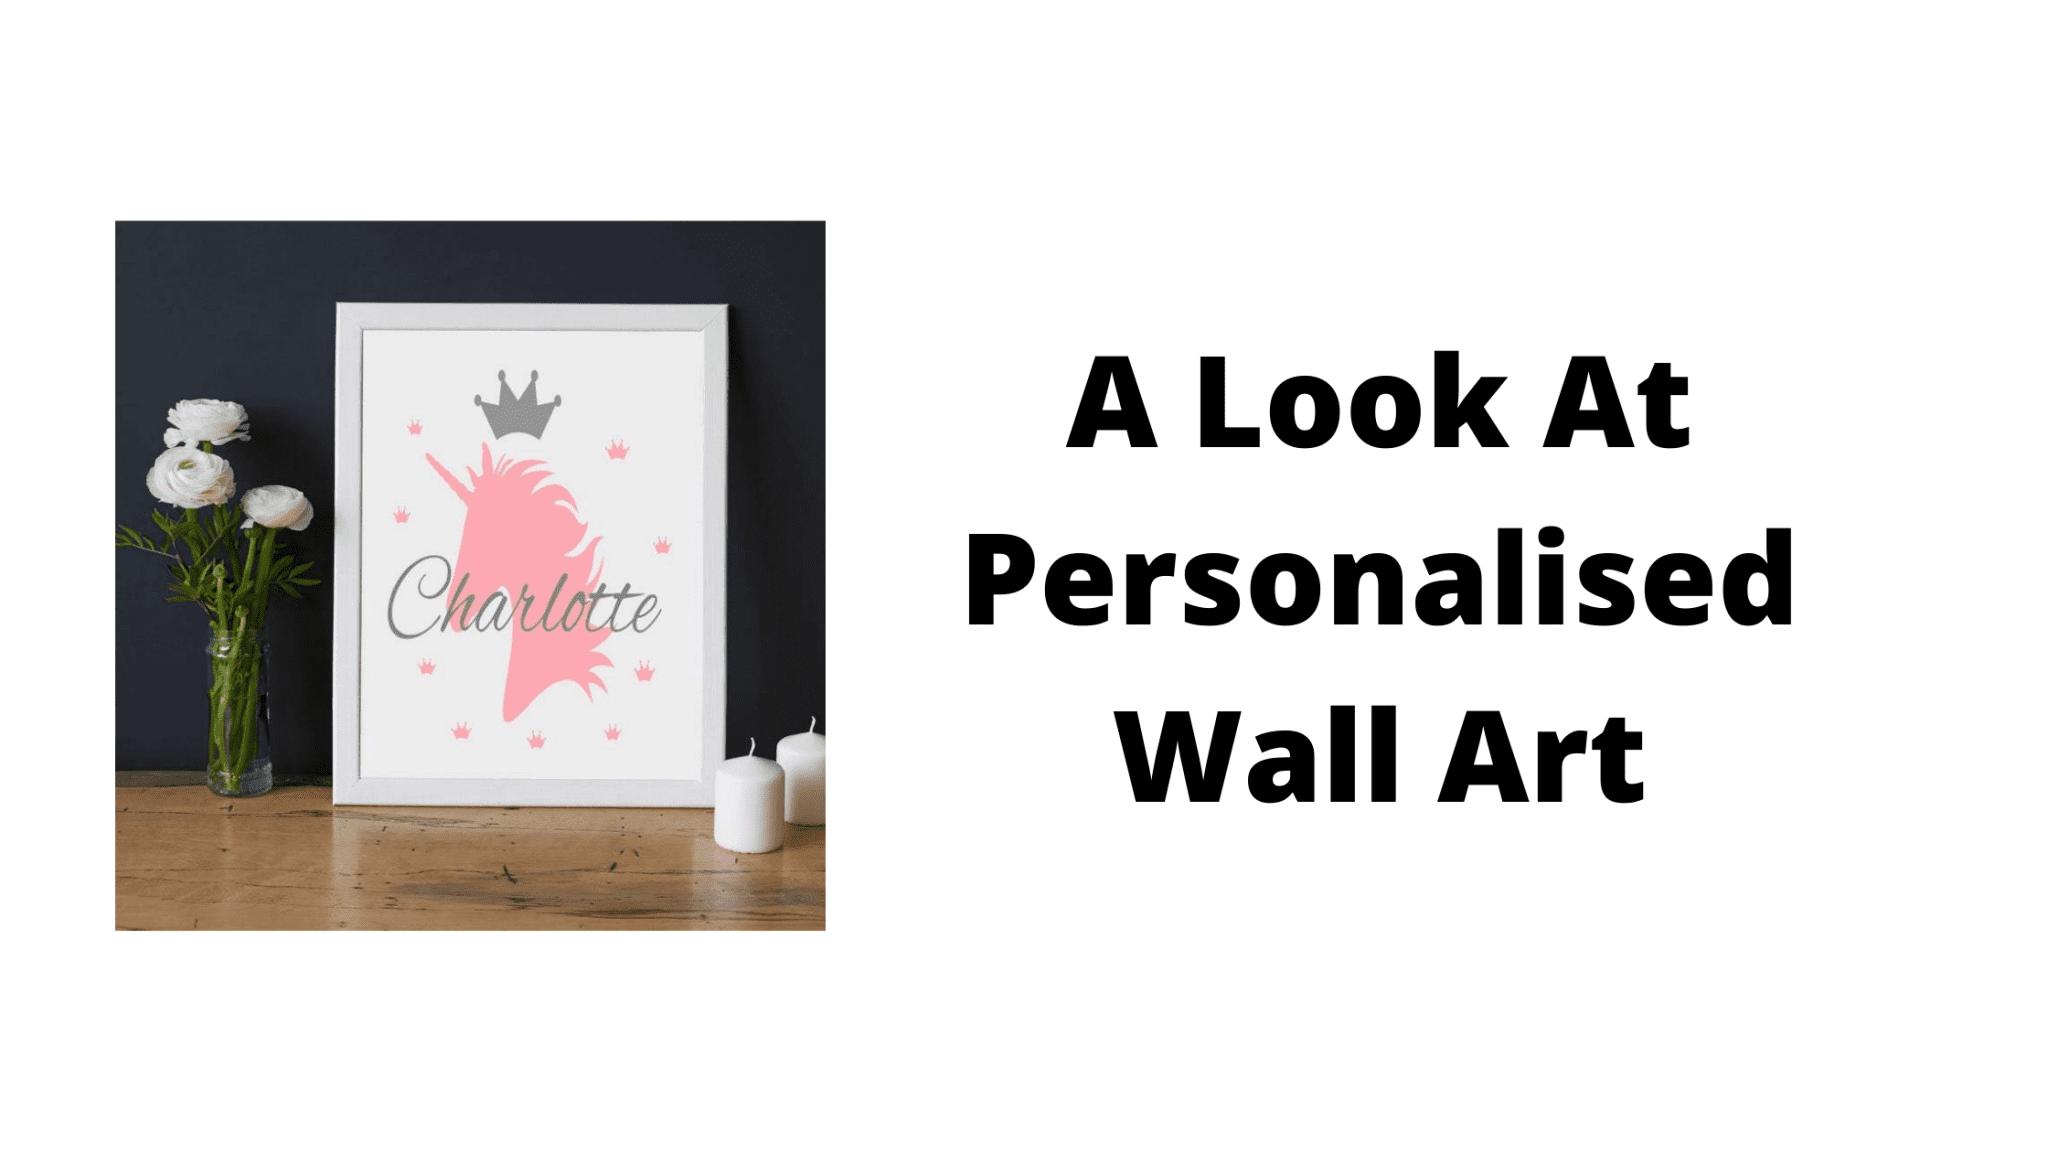 A Look At Personalised Wall Art